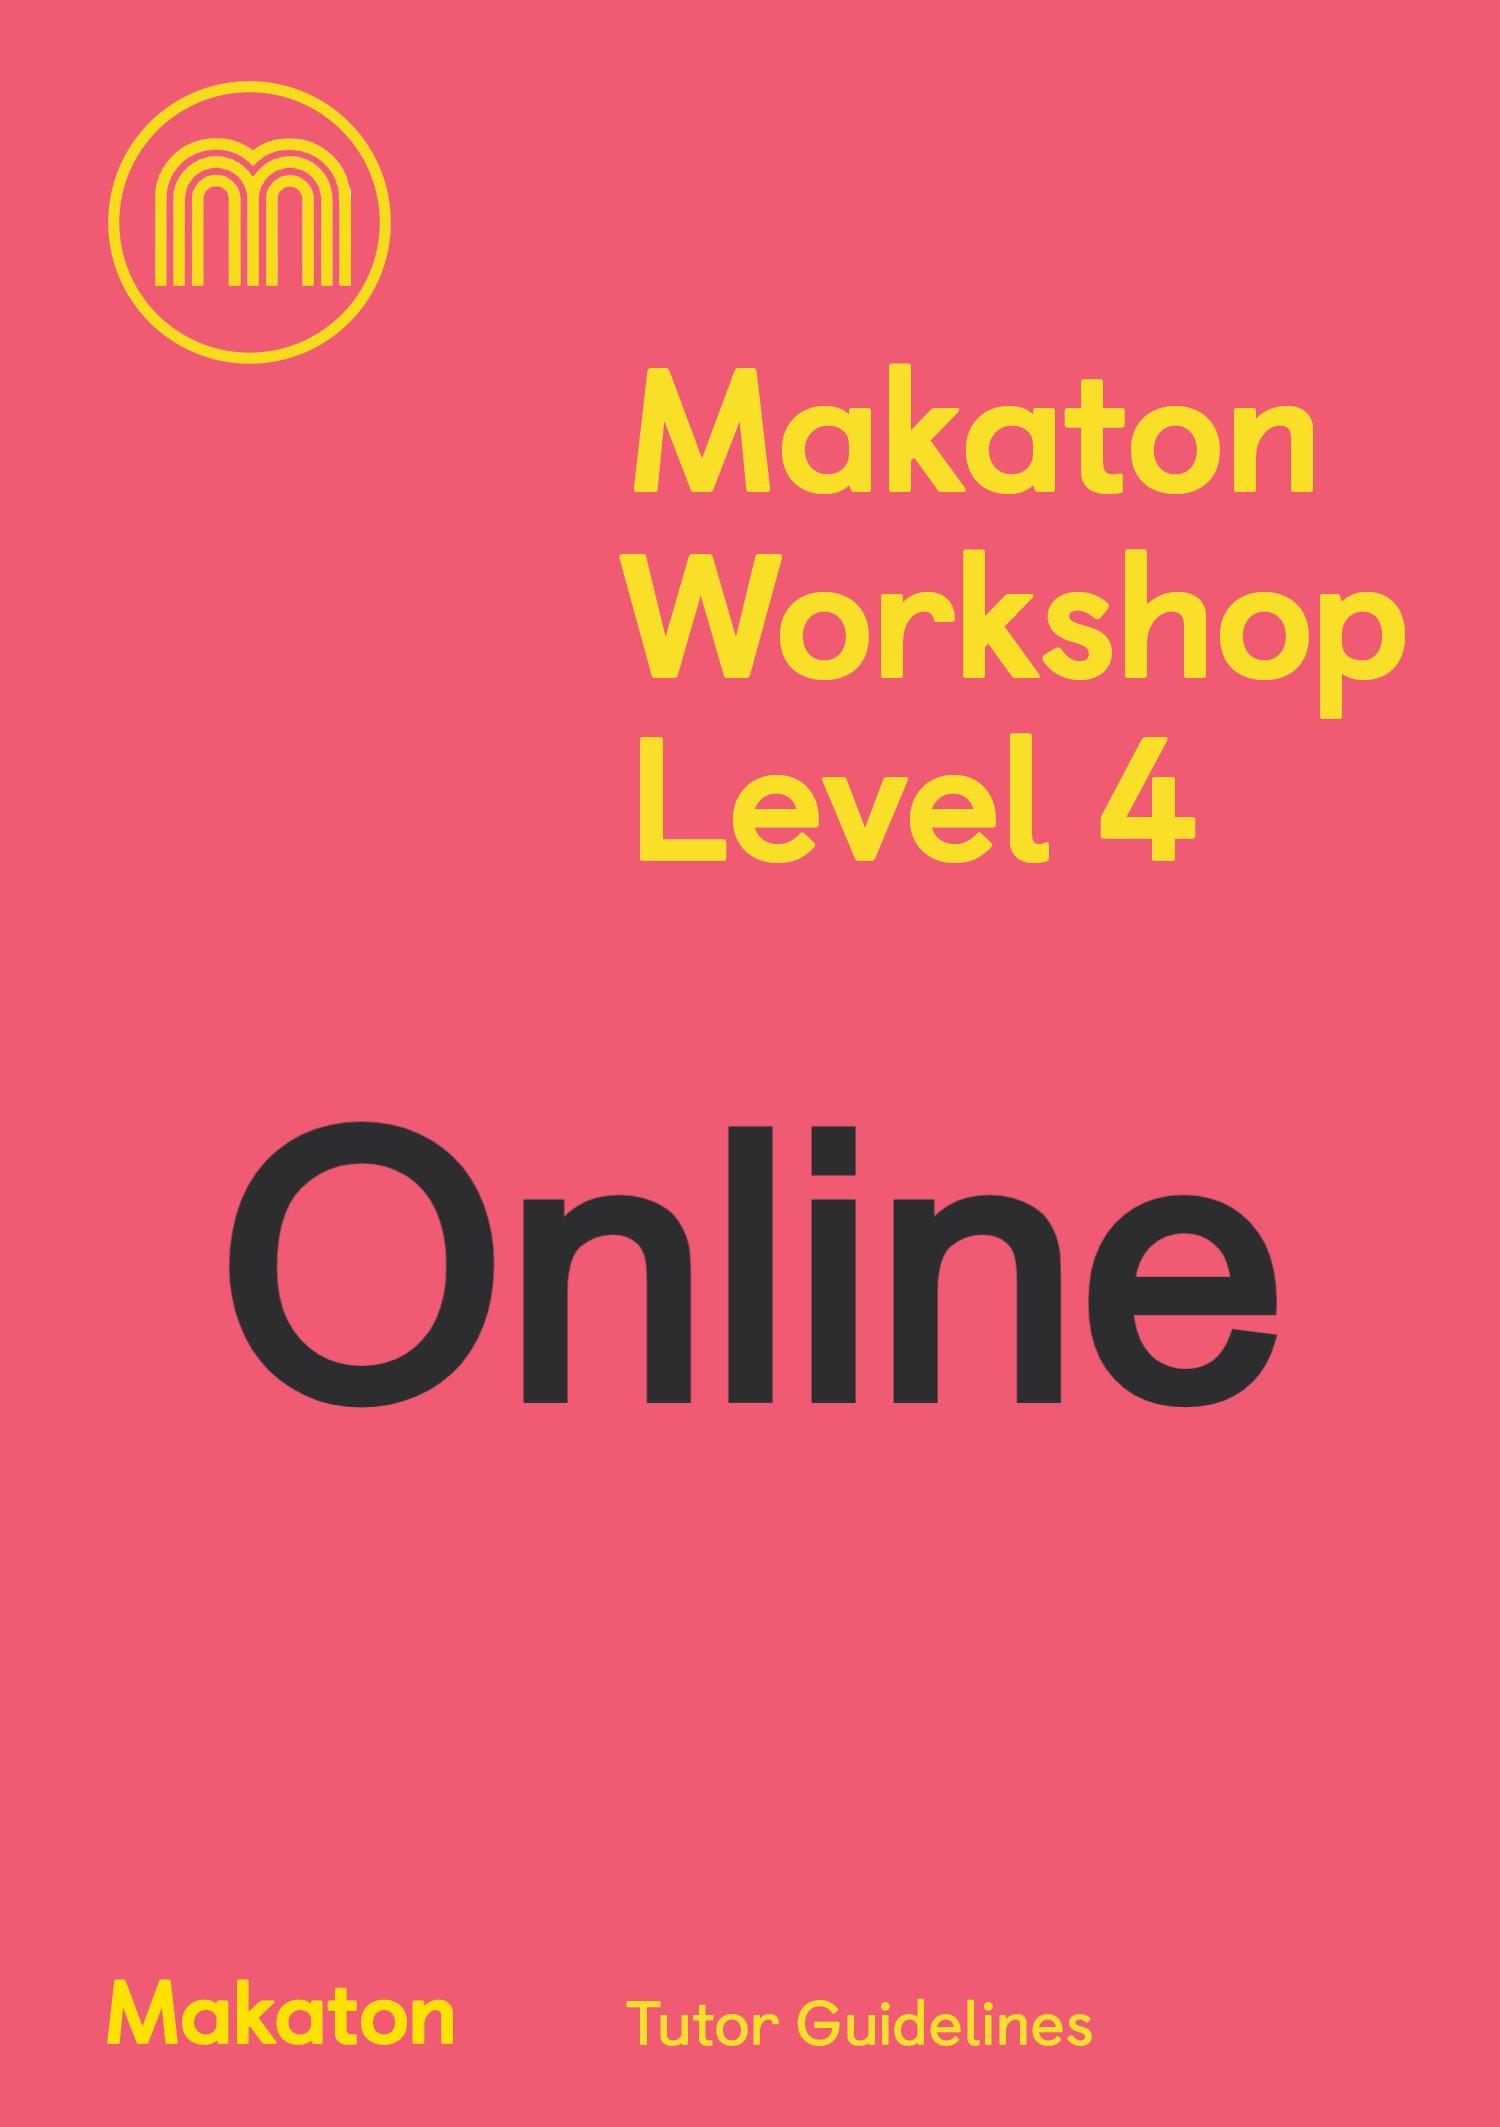 ONLINE Makaton Workshop Level 4